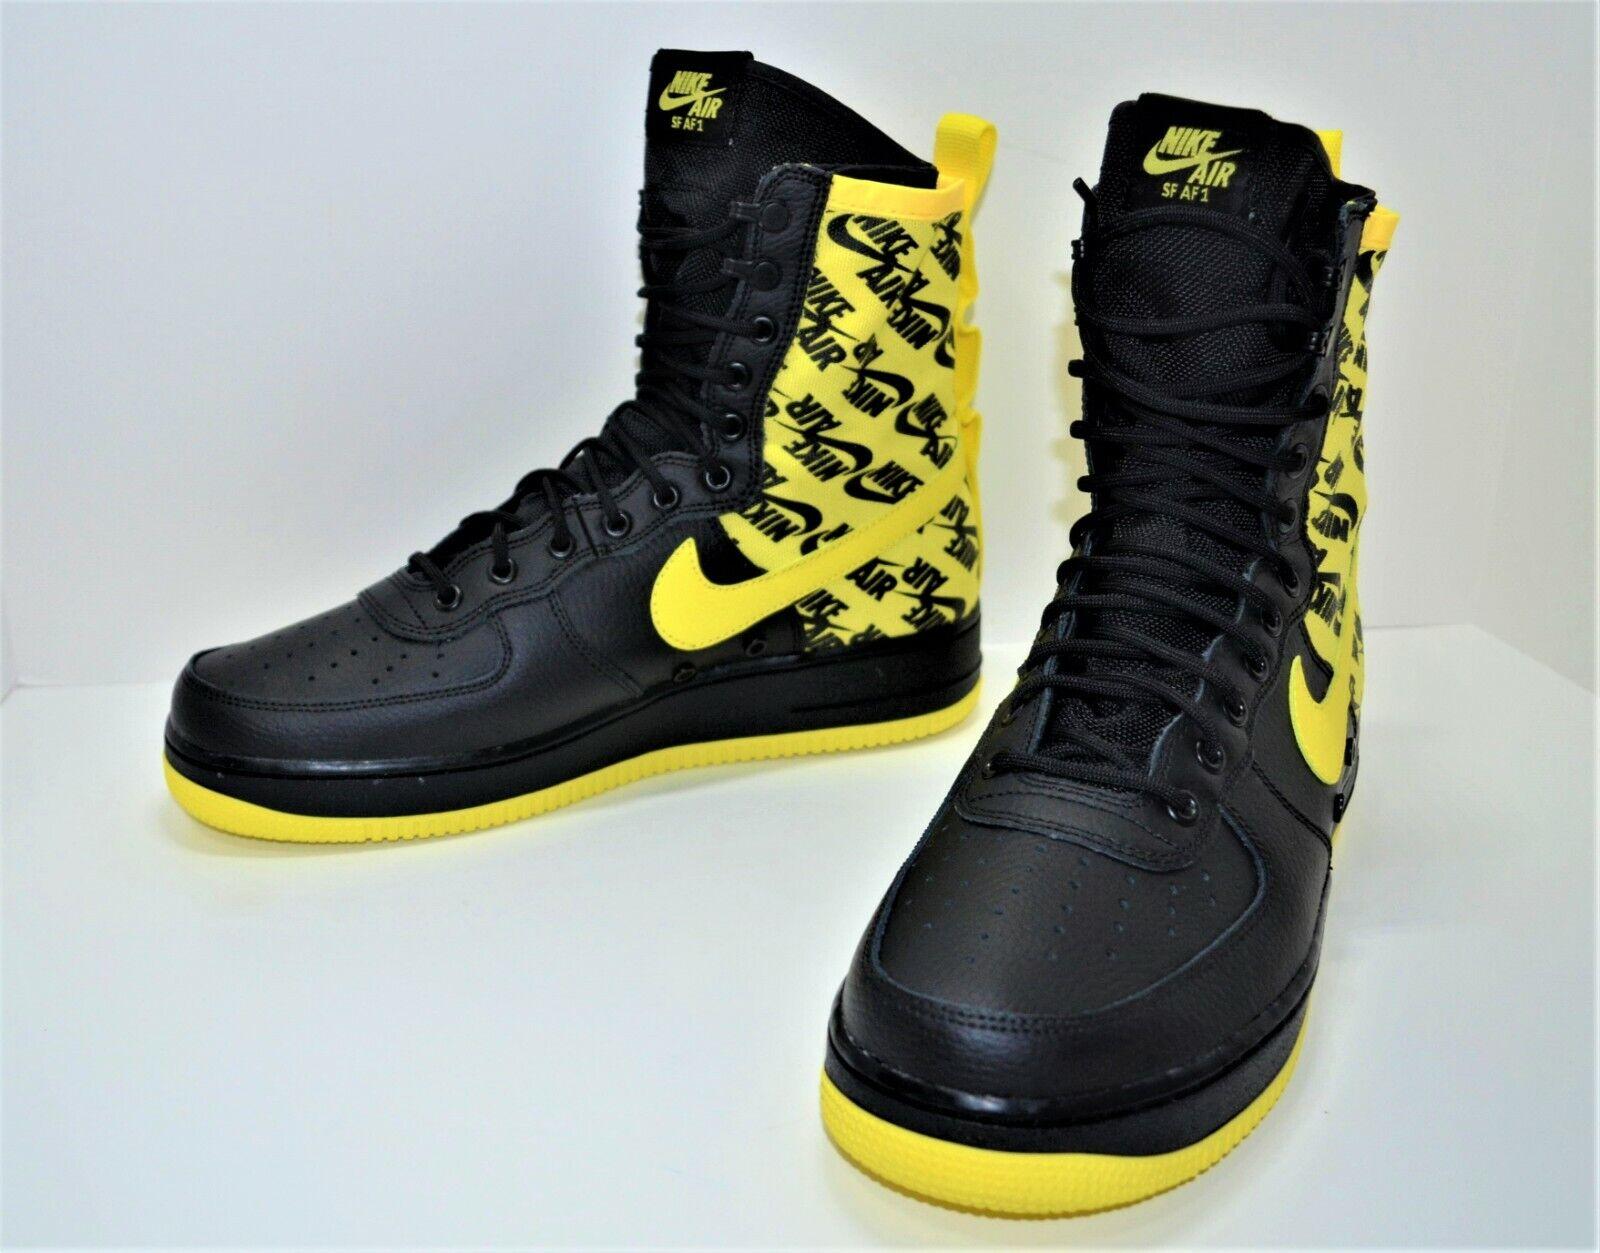 Size 11 - Nike Sf Air Force 1 Dynamic